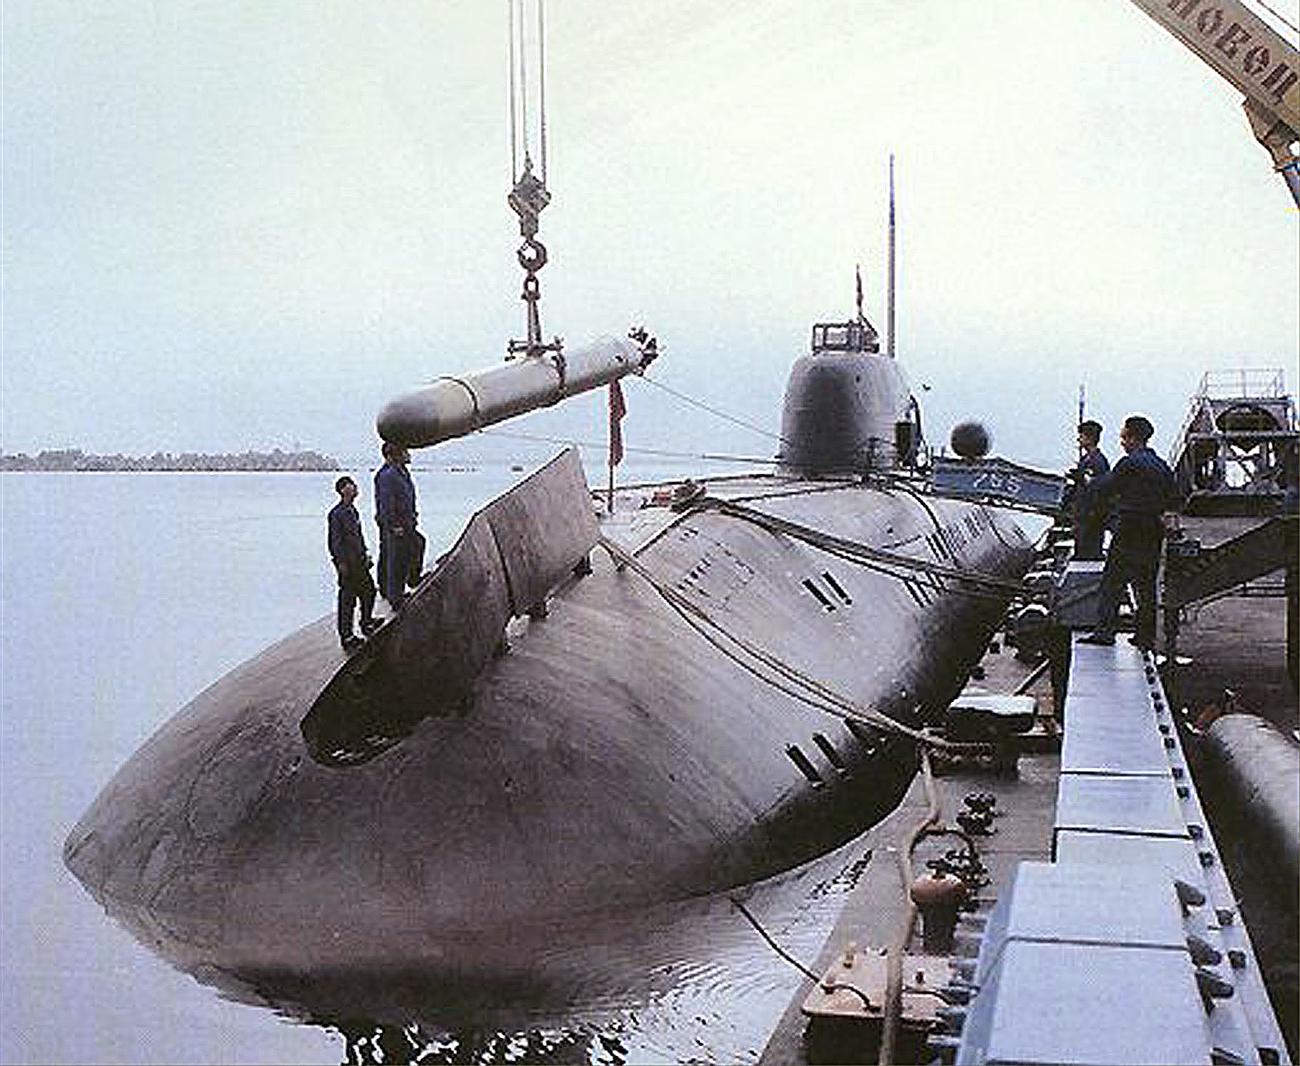 Sebuah foto tanpa tanggal menunjukkan roket sonar tengah dimuat ke dalam kapal selam Rusia kelas Oscar.